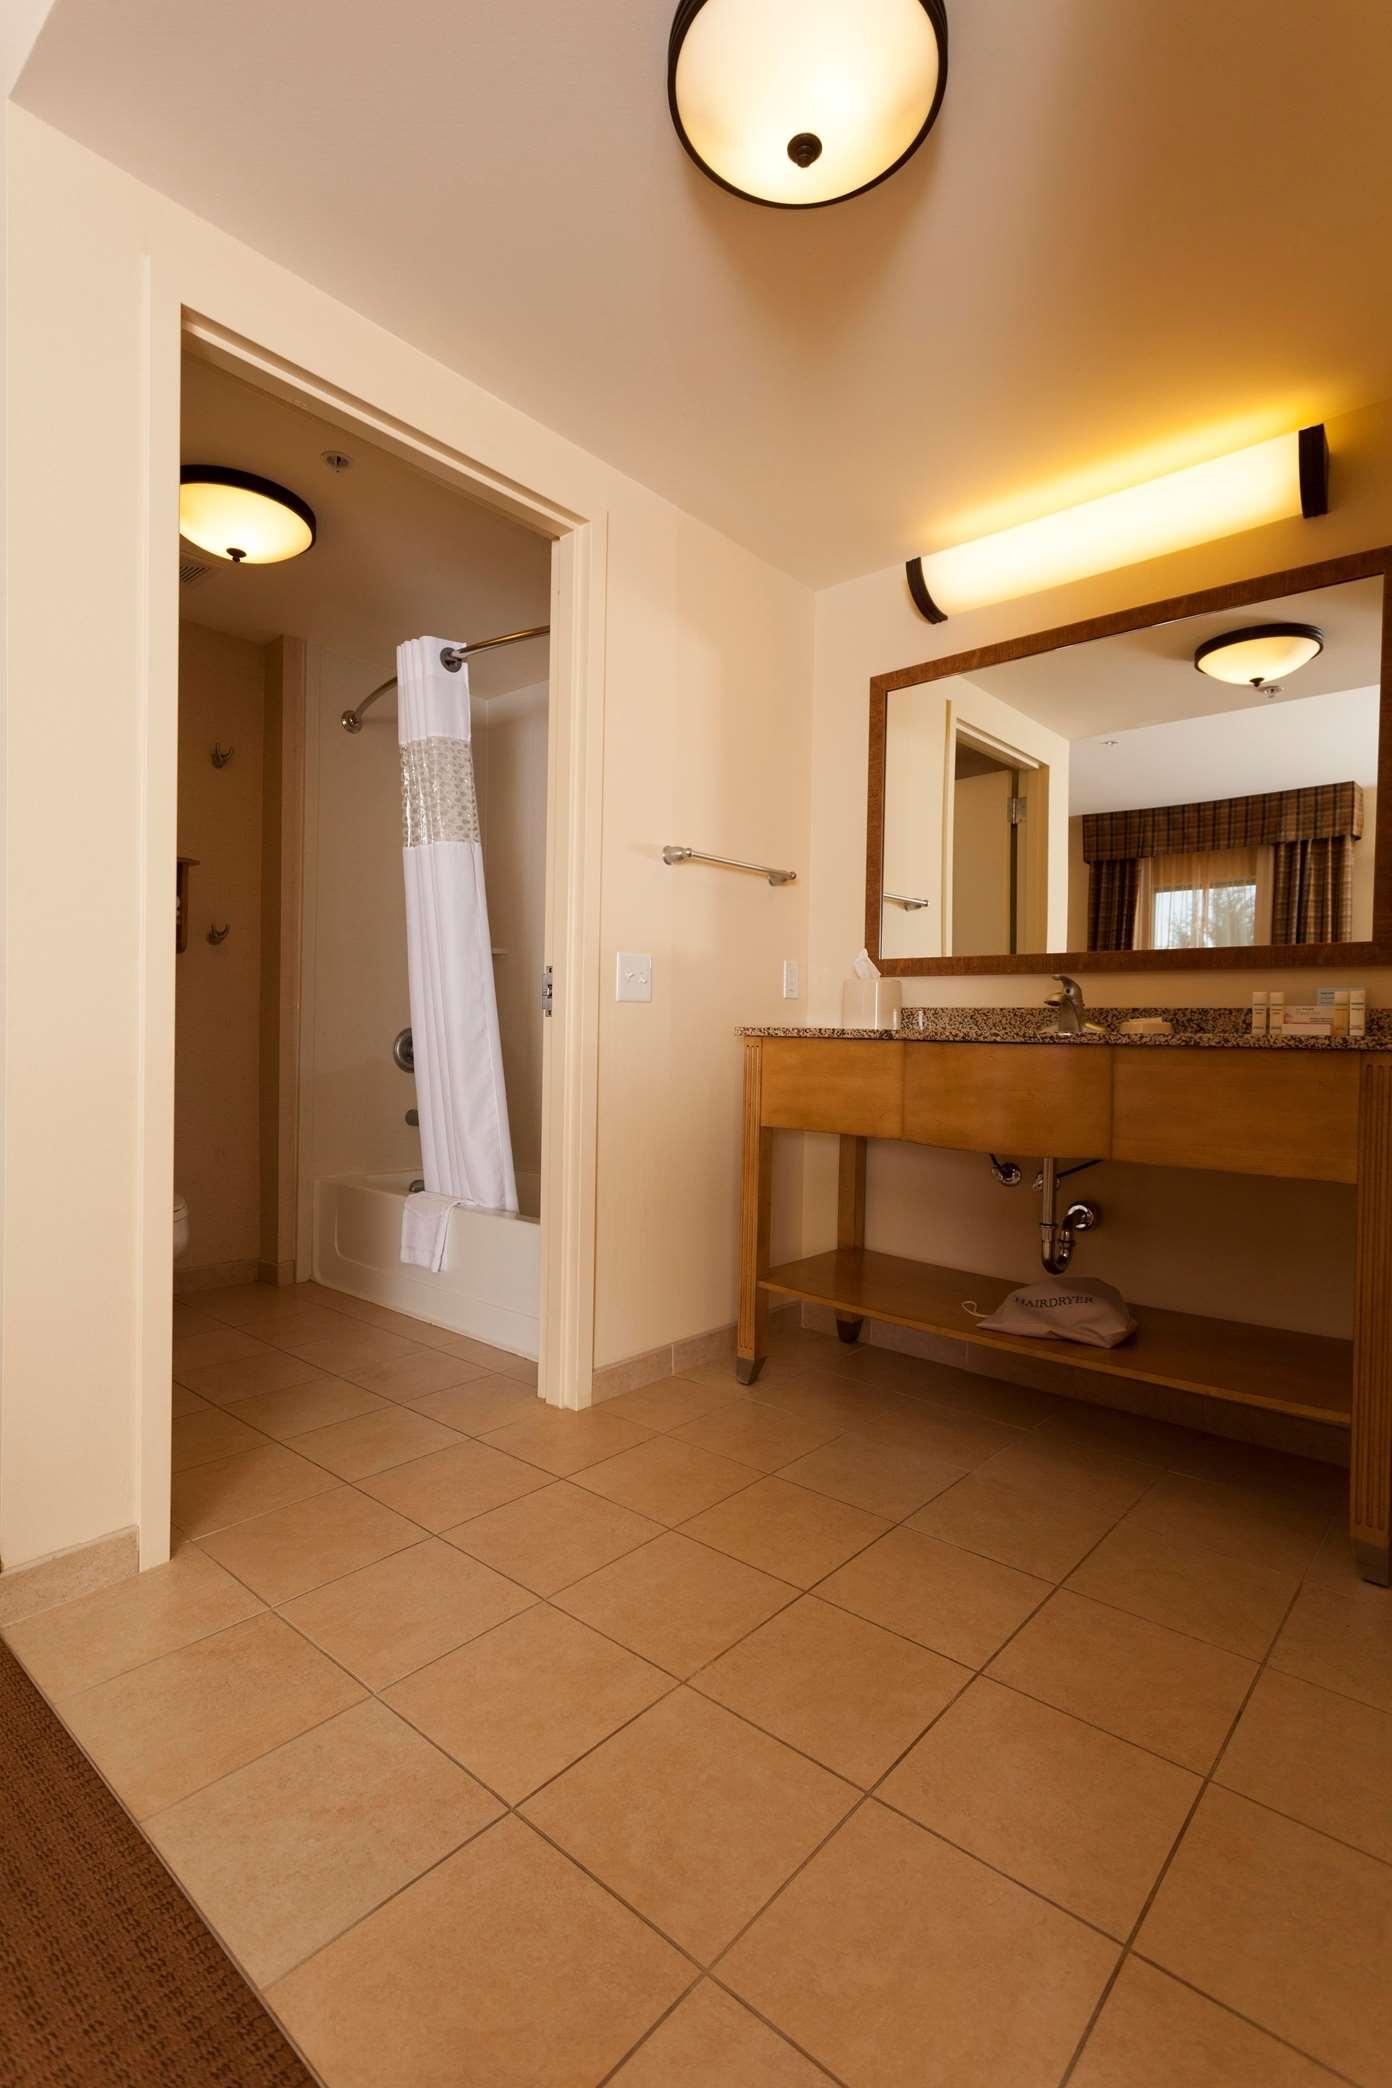 Hampton Inn & Suites Riverton image 7